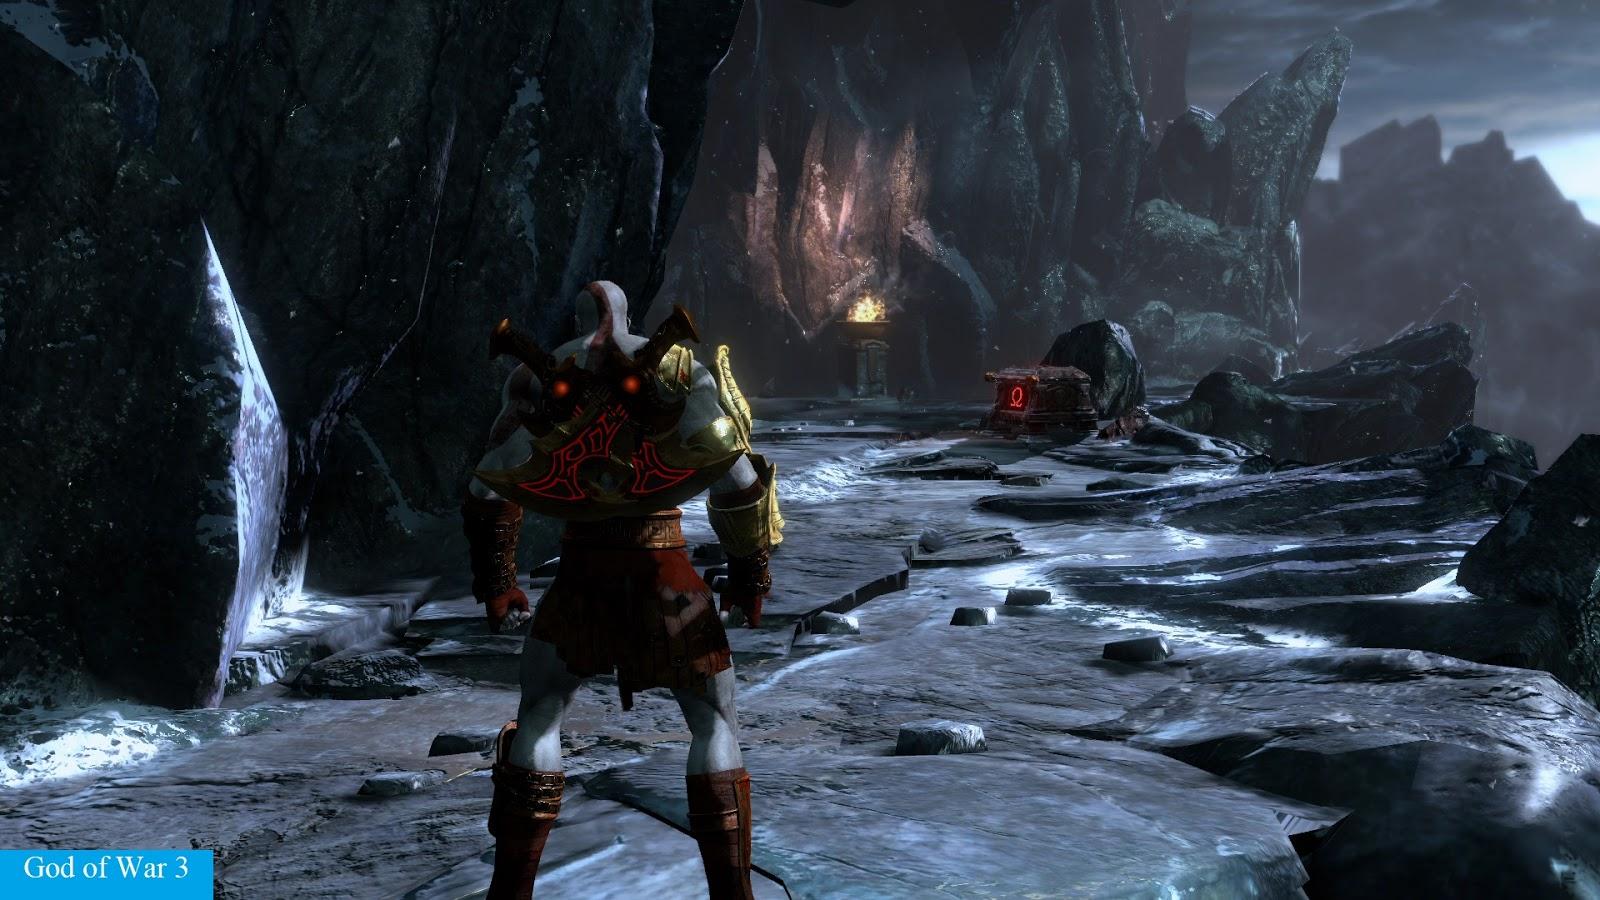 تحميل لعبه God Of War 3 Free Download For Pc Games